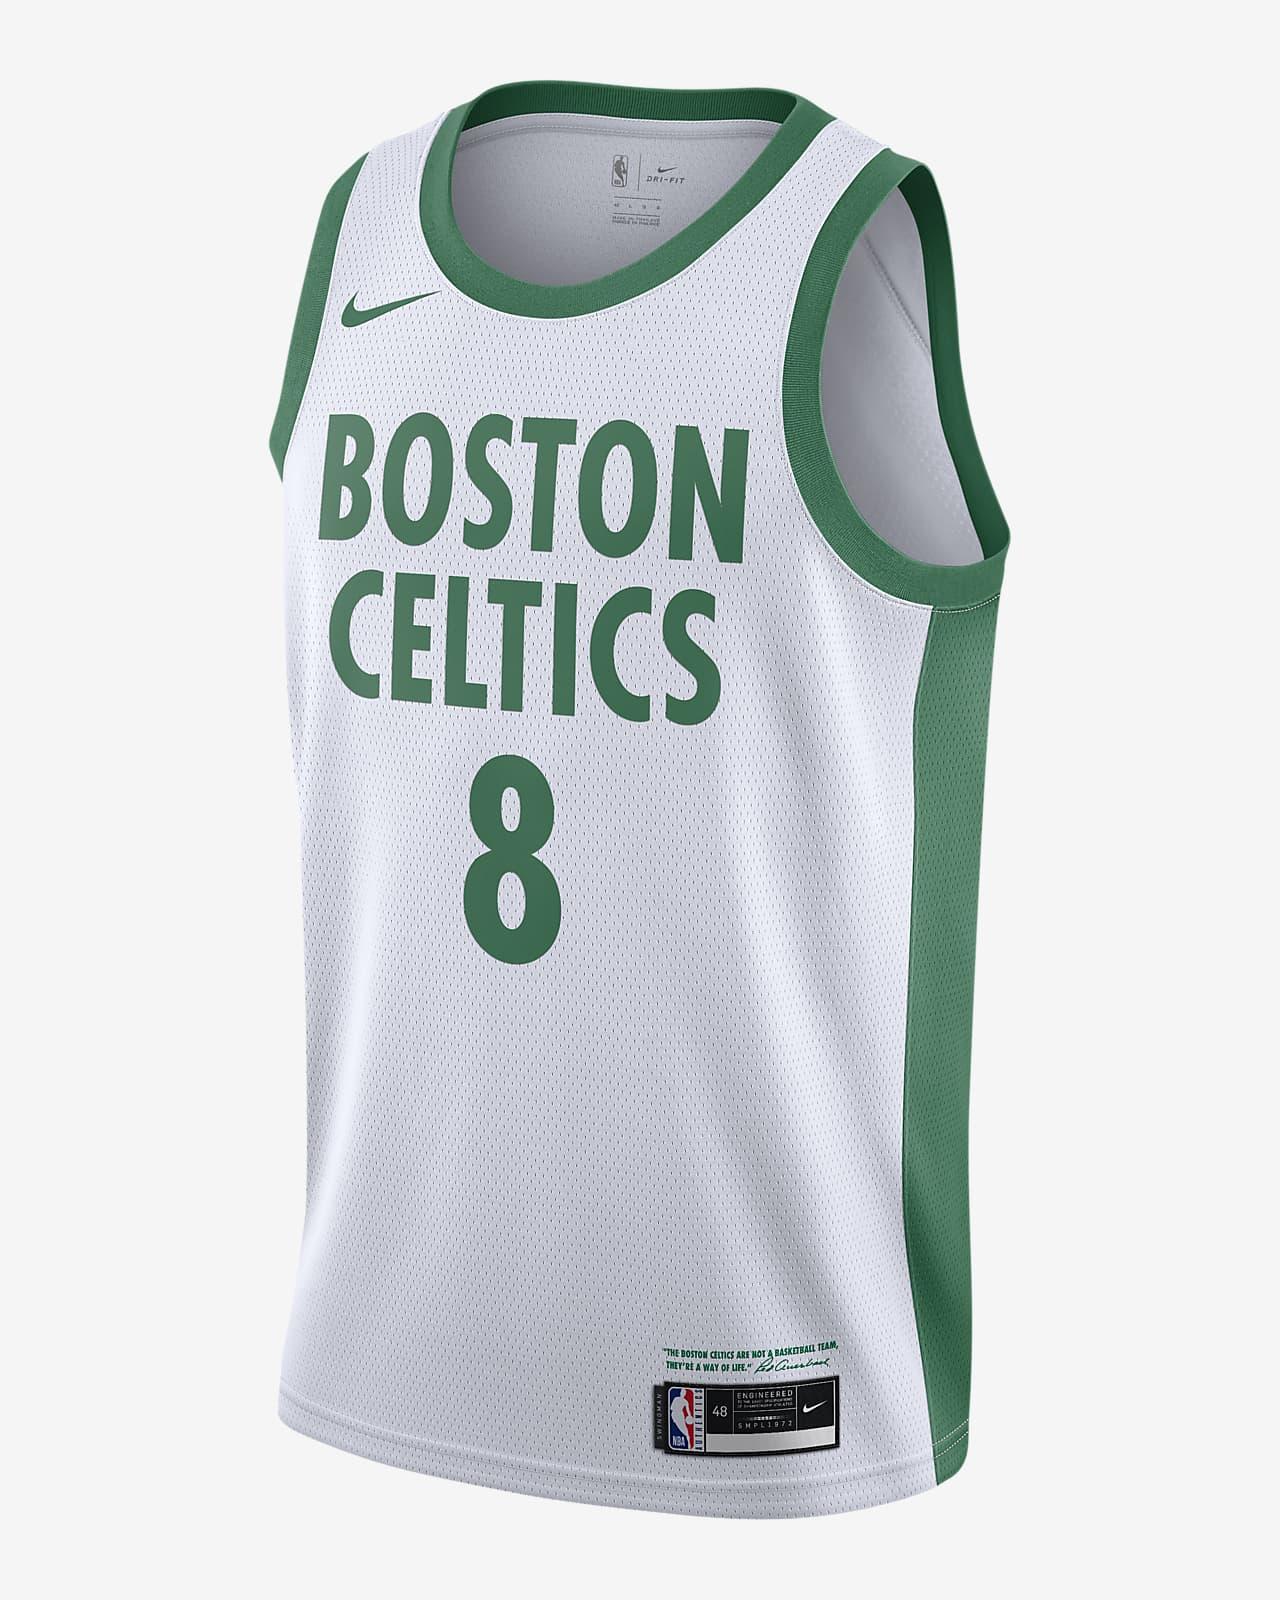 Maillot Nike NBA Swingman Kemba Walker Boston Celtics City Edition